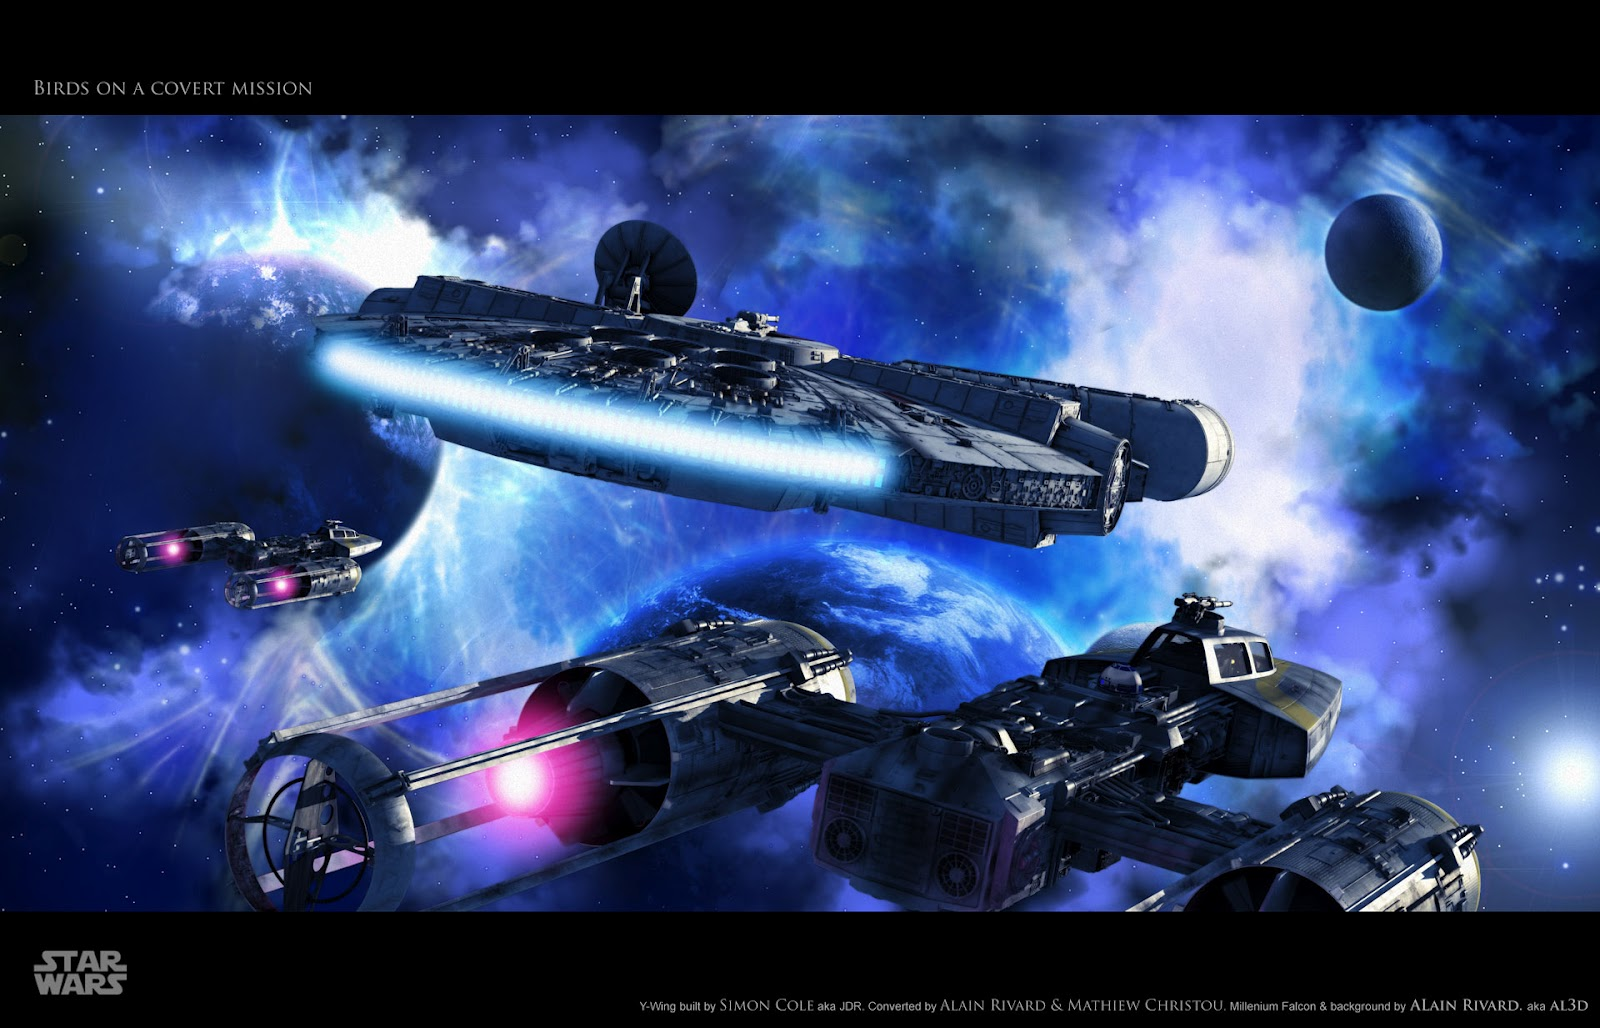 star wars desktop wallpaper hd - photo #17